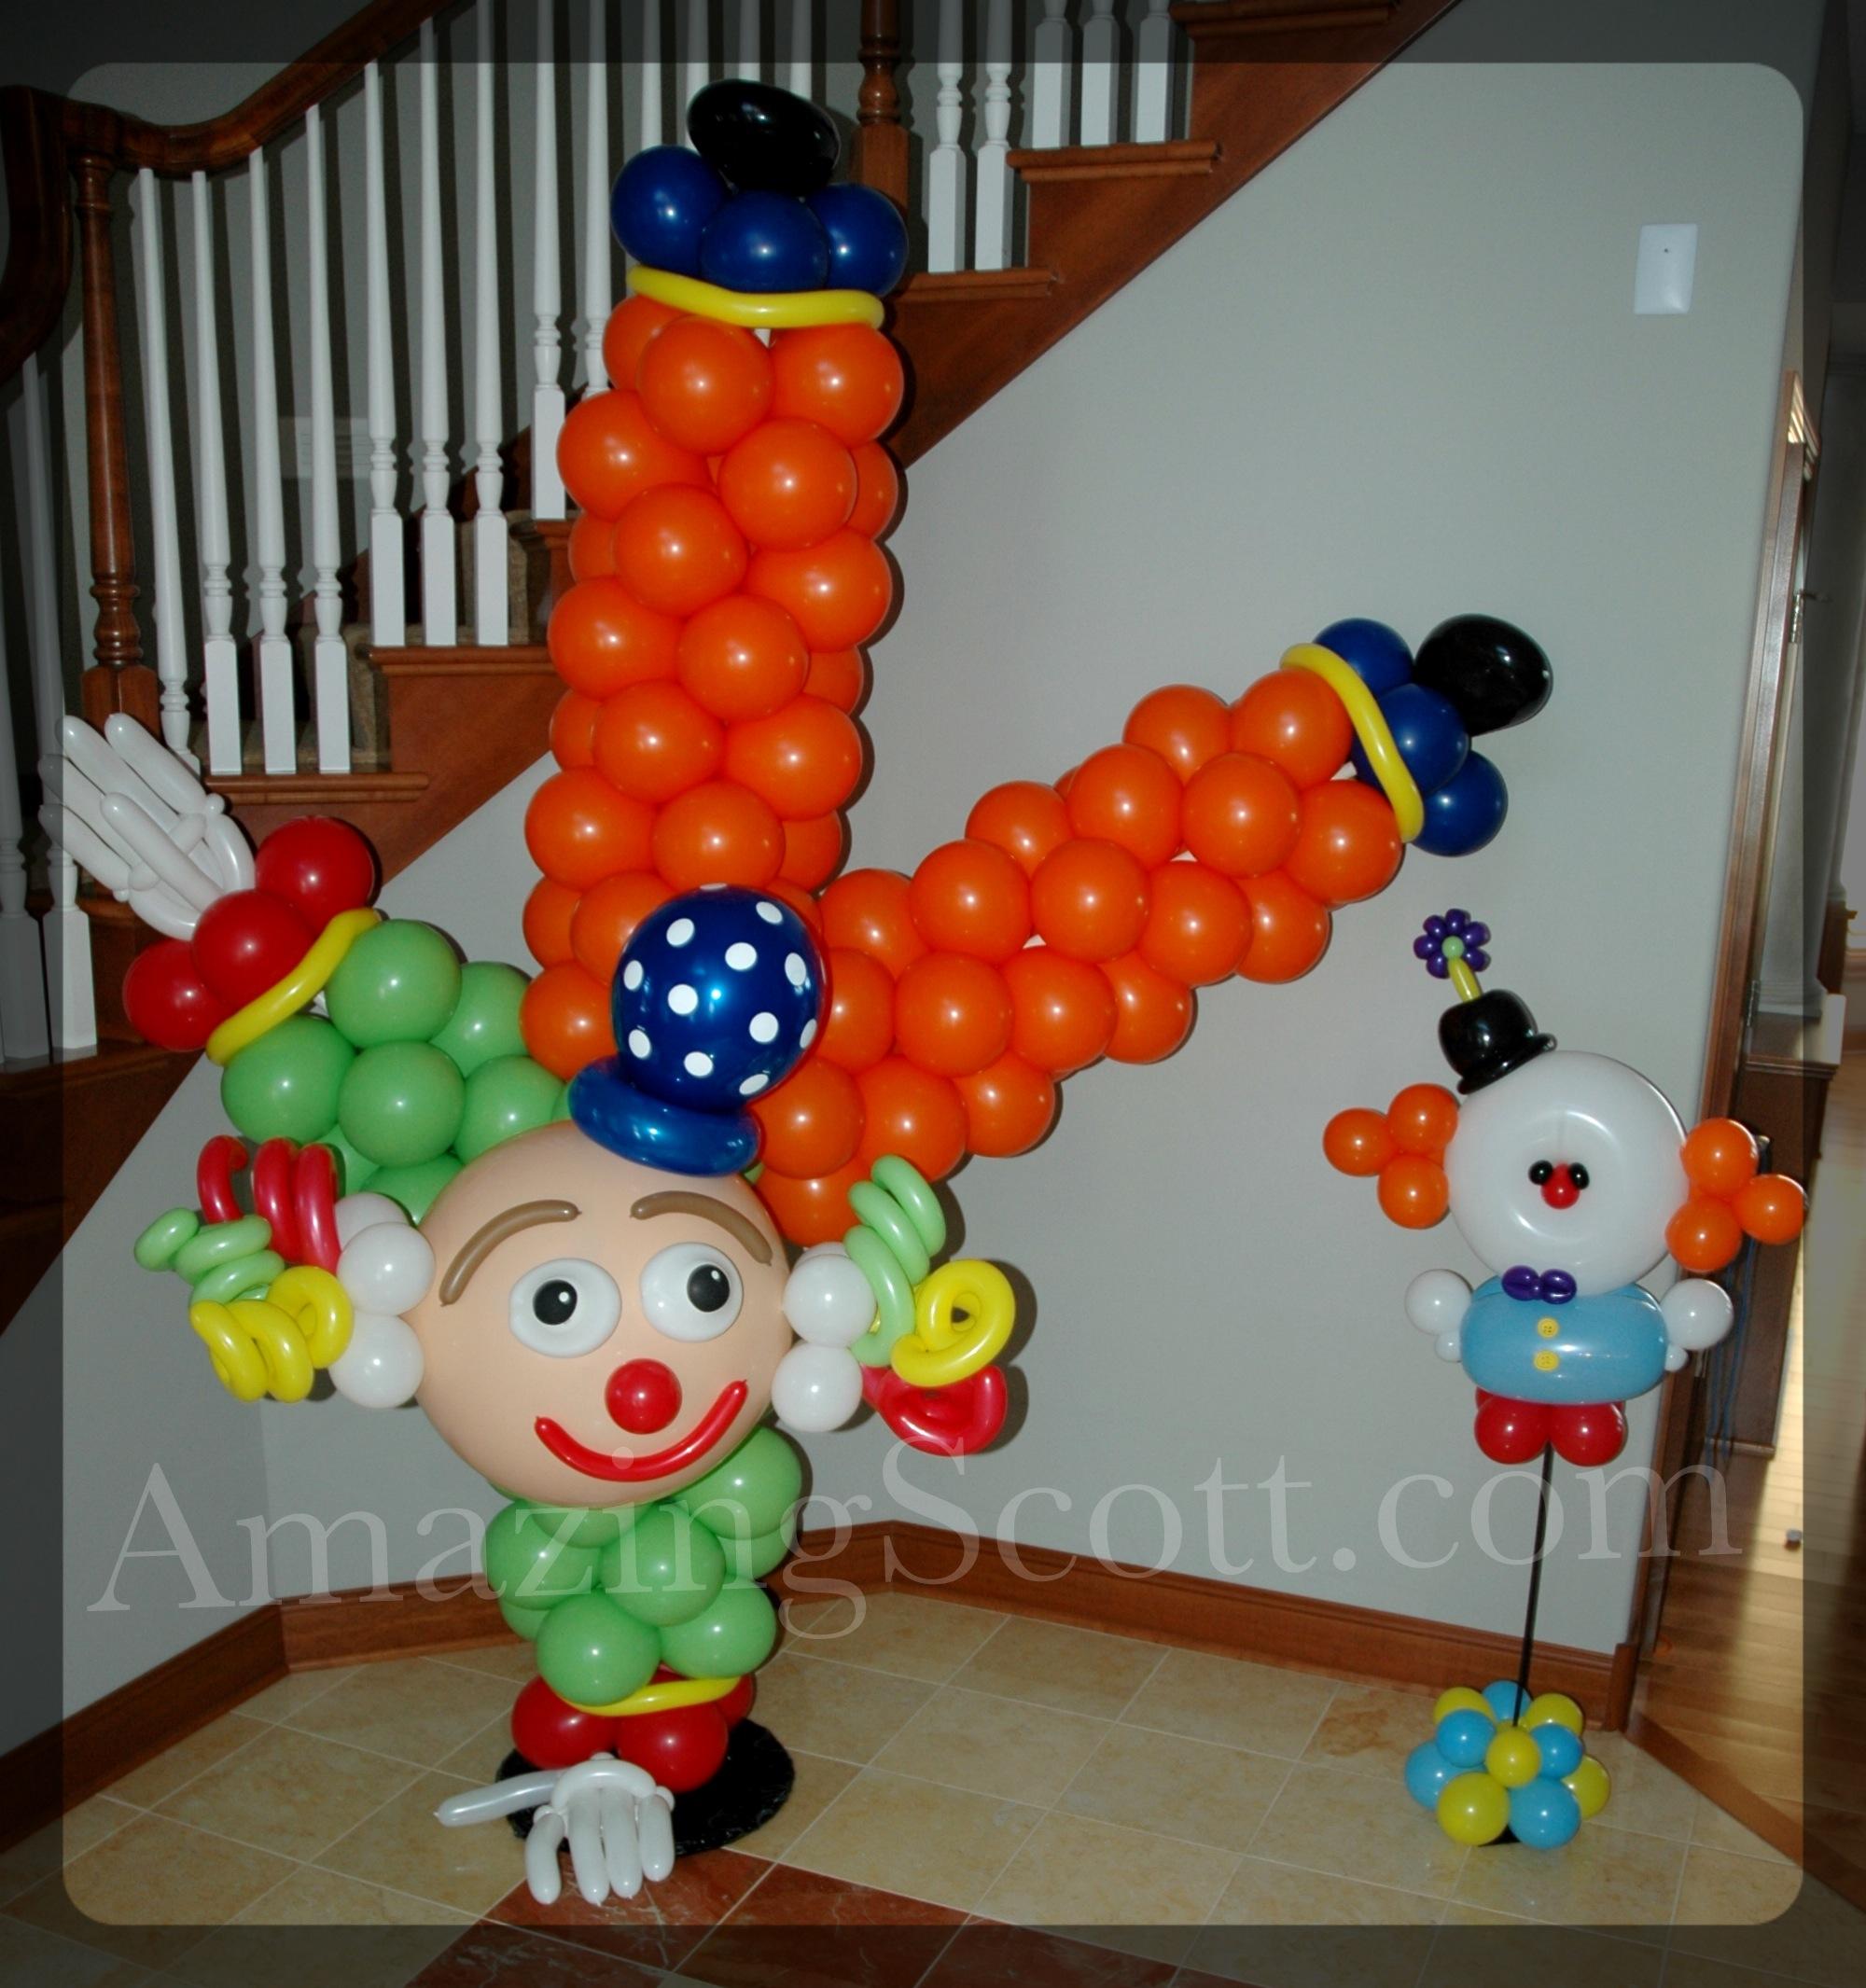 Large clown 2.jpg